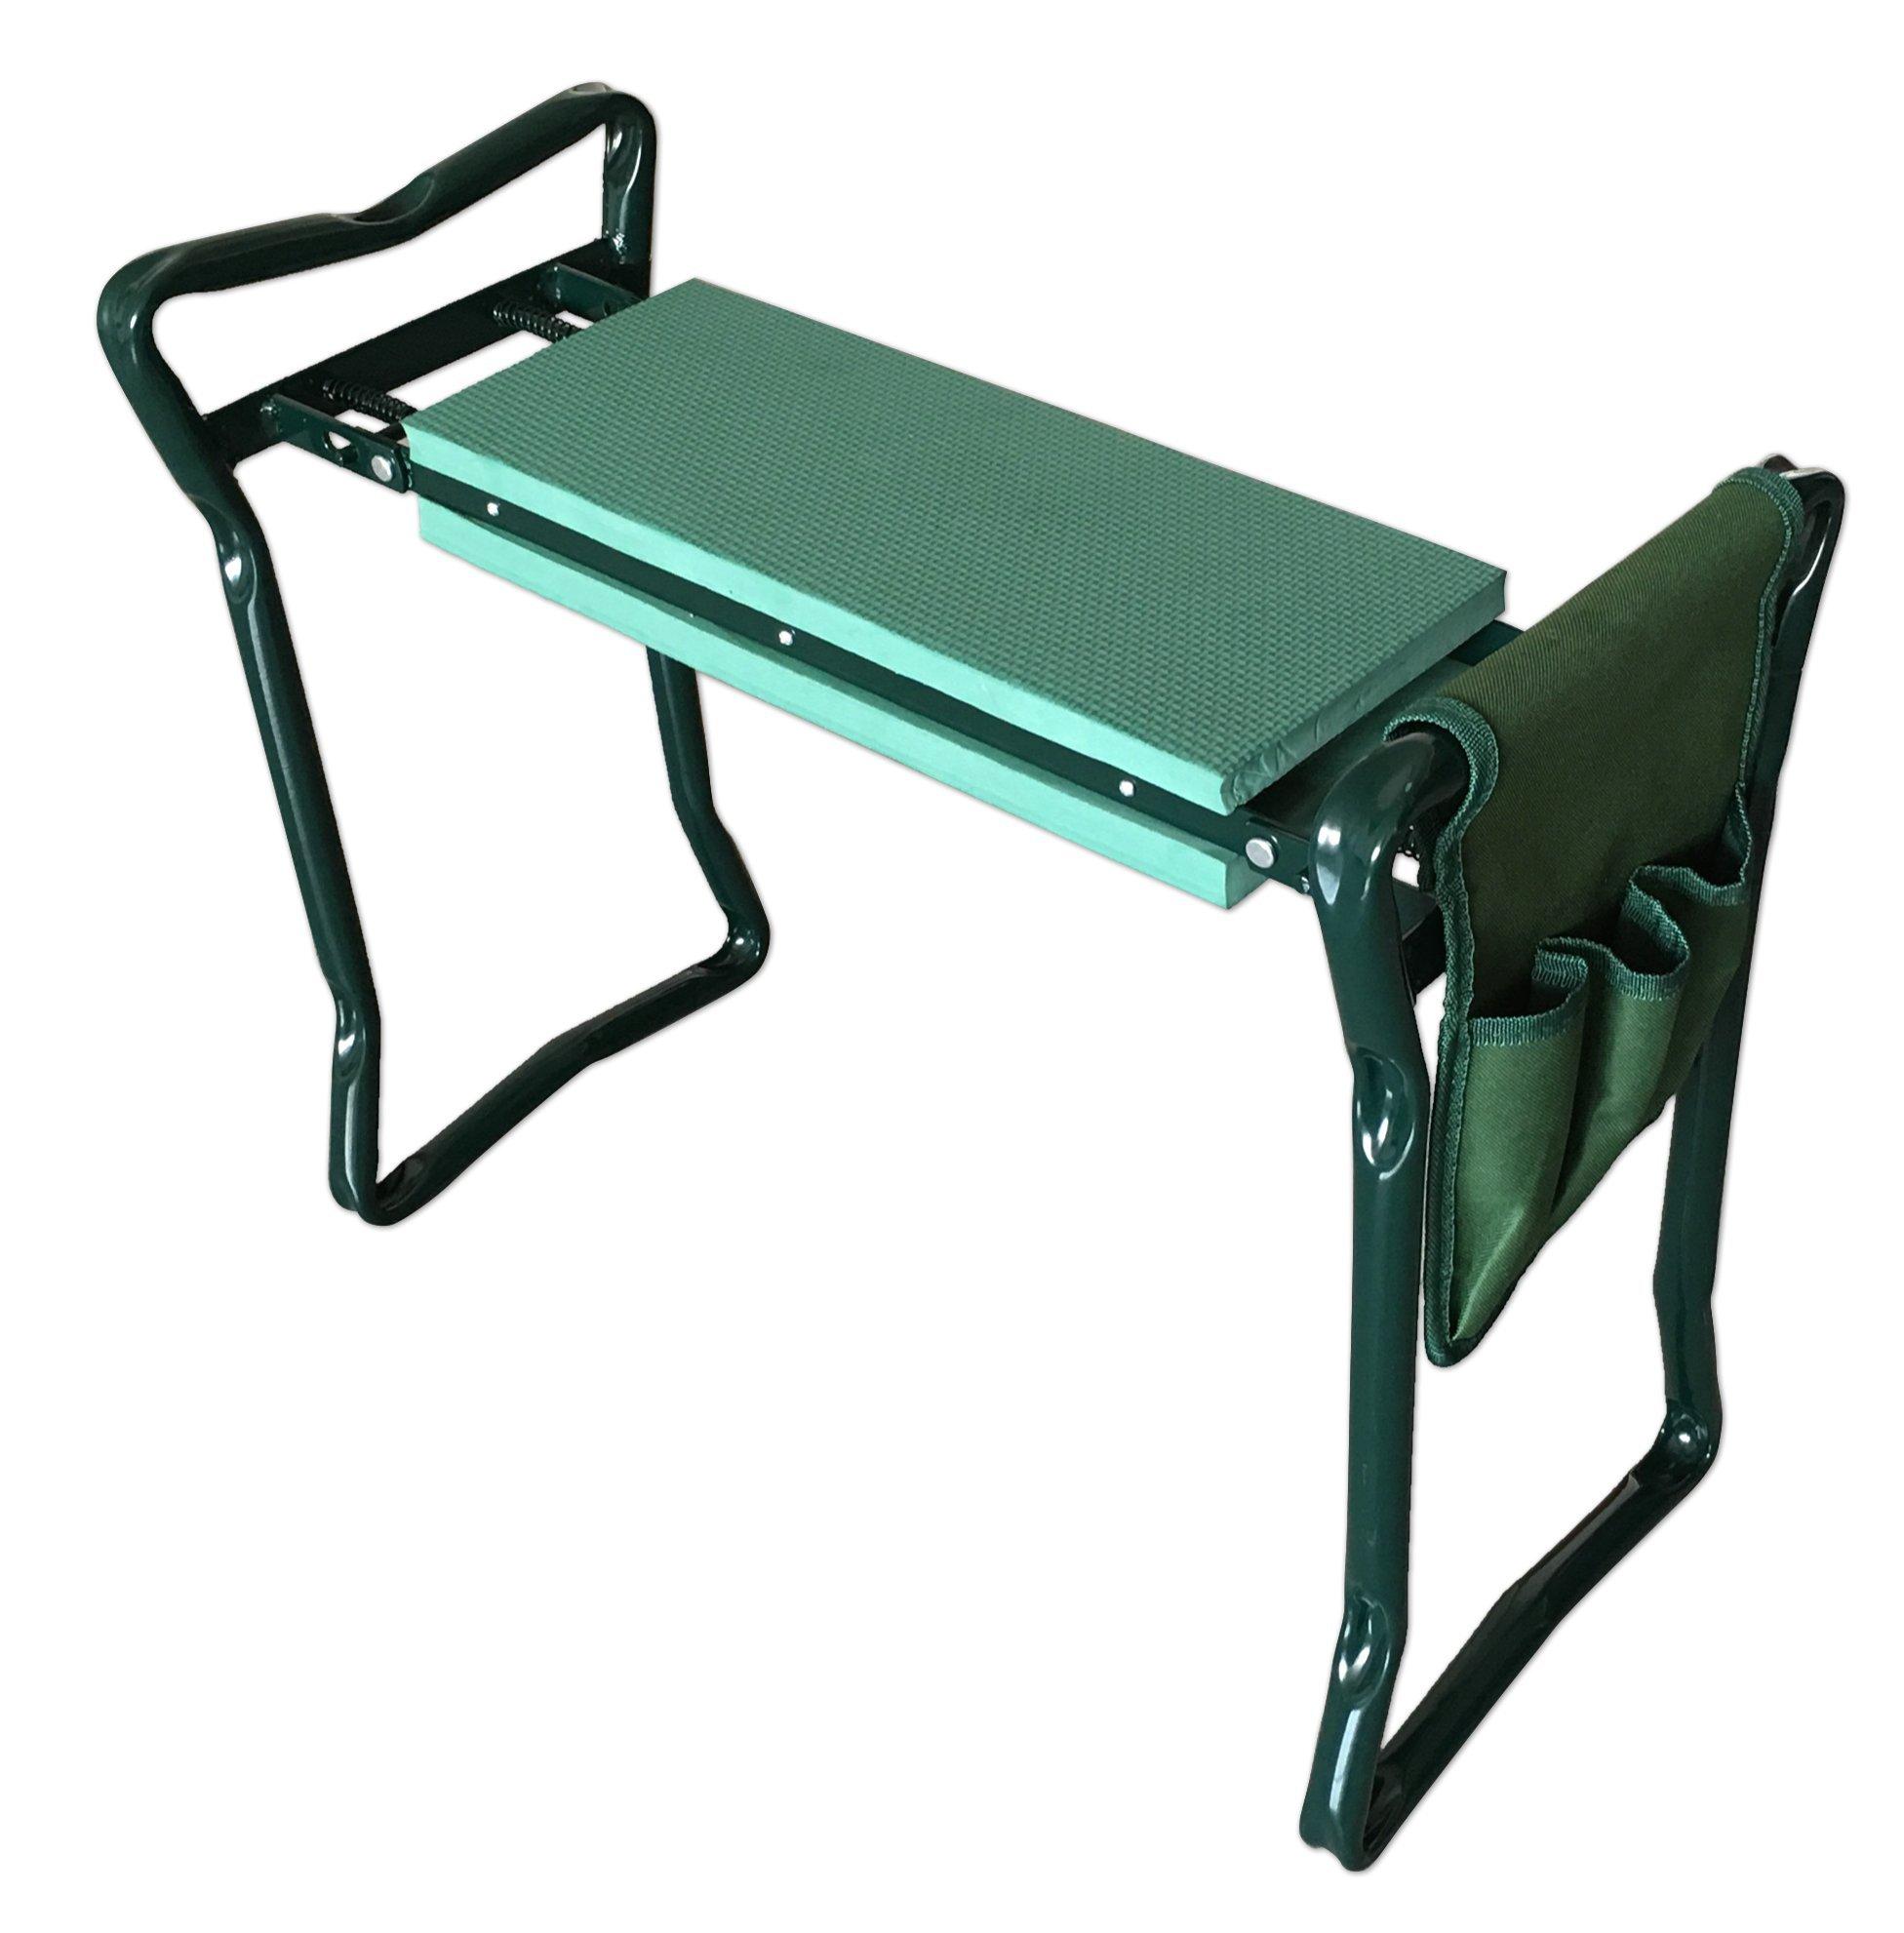 Marvelous Buy Church Travel Wood Folding Prayer Kneeler Pecan Finish Machost Co Dining Chair Design Ideas Machostcouk